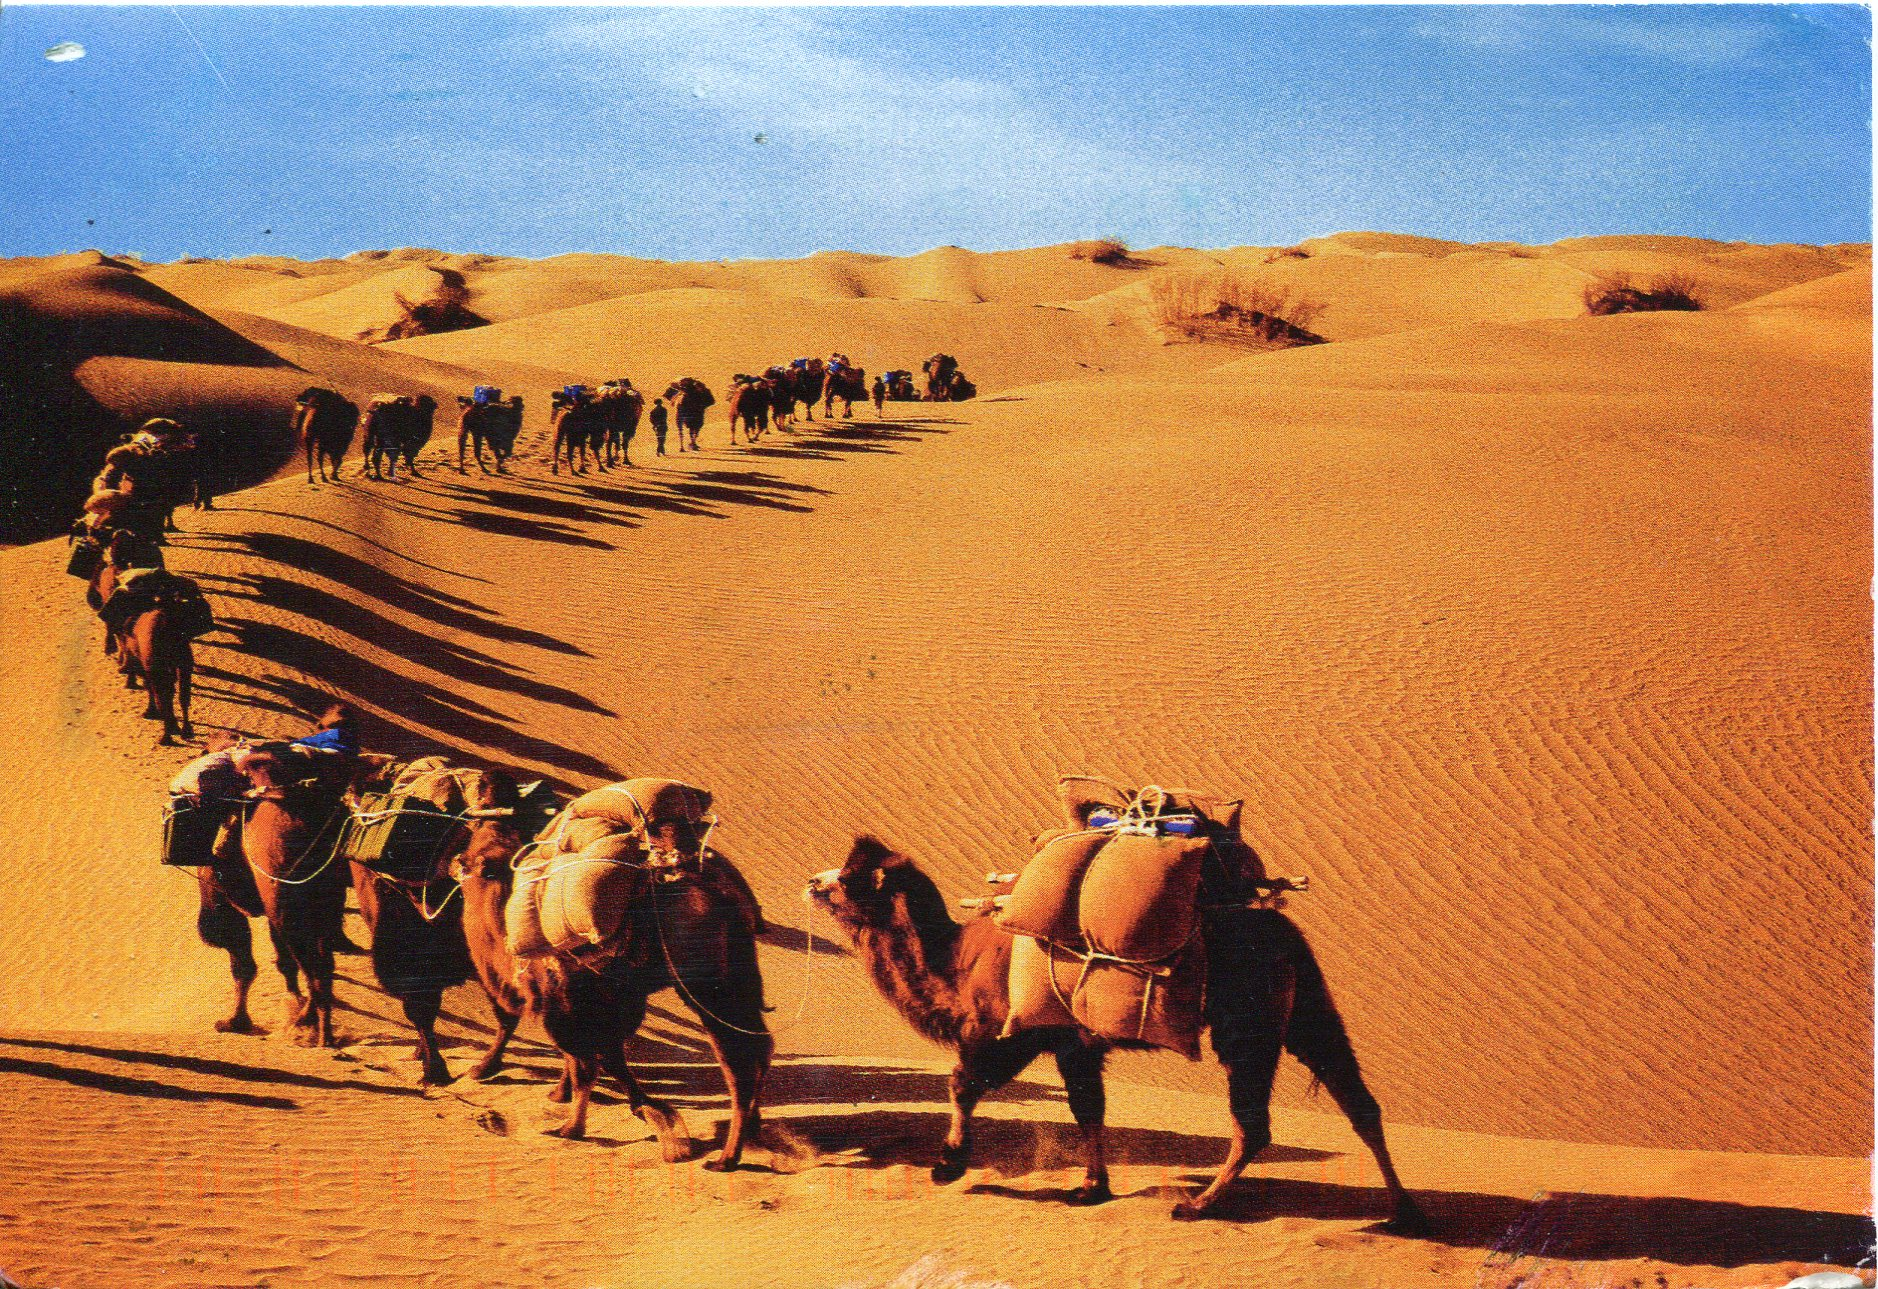 Camel Caravan in Sahara Desert, North Africa - Travel and Escape